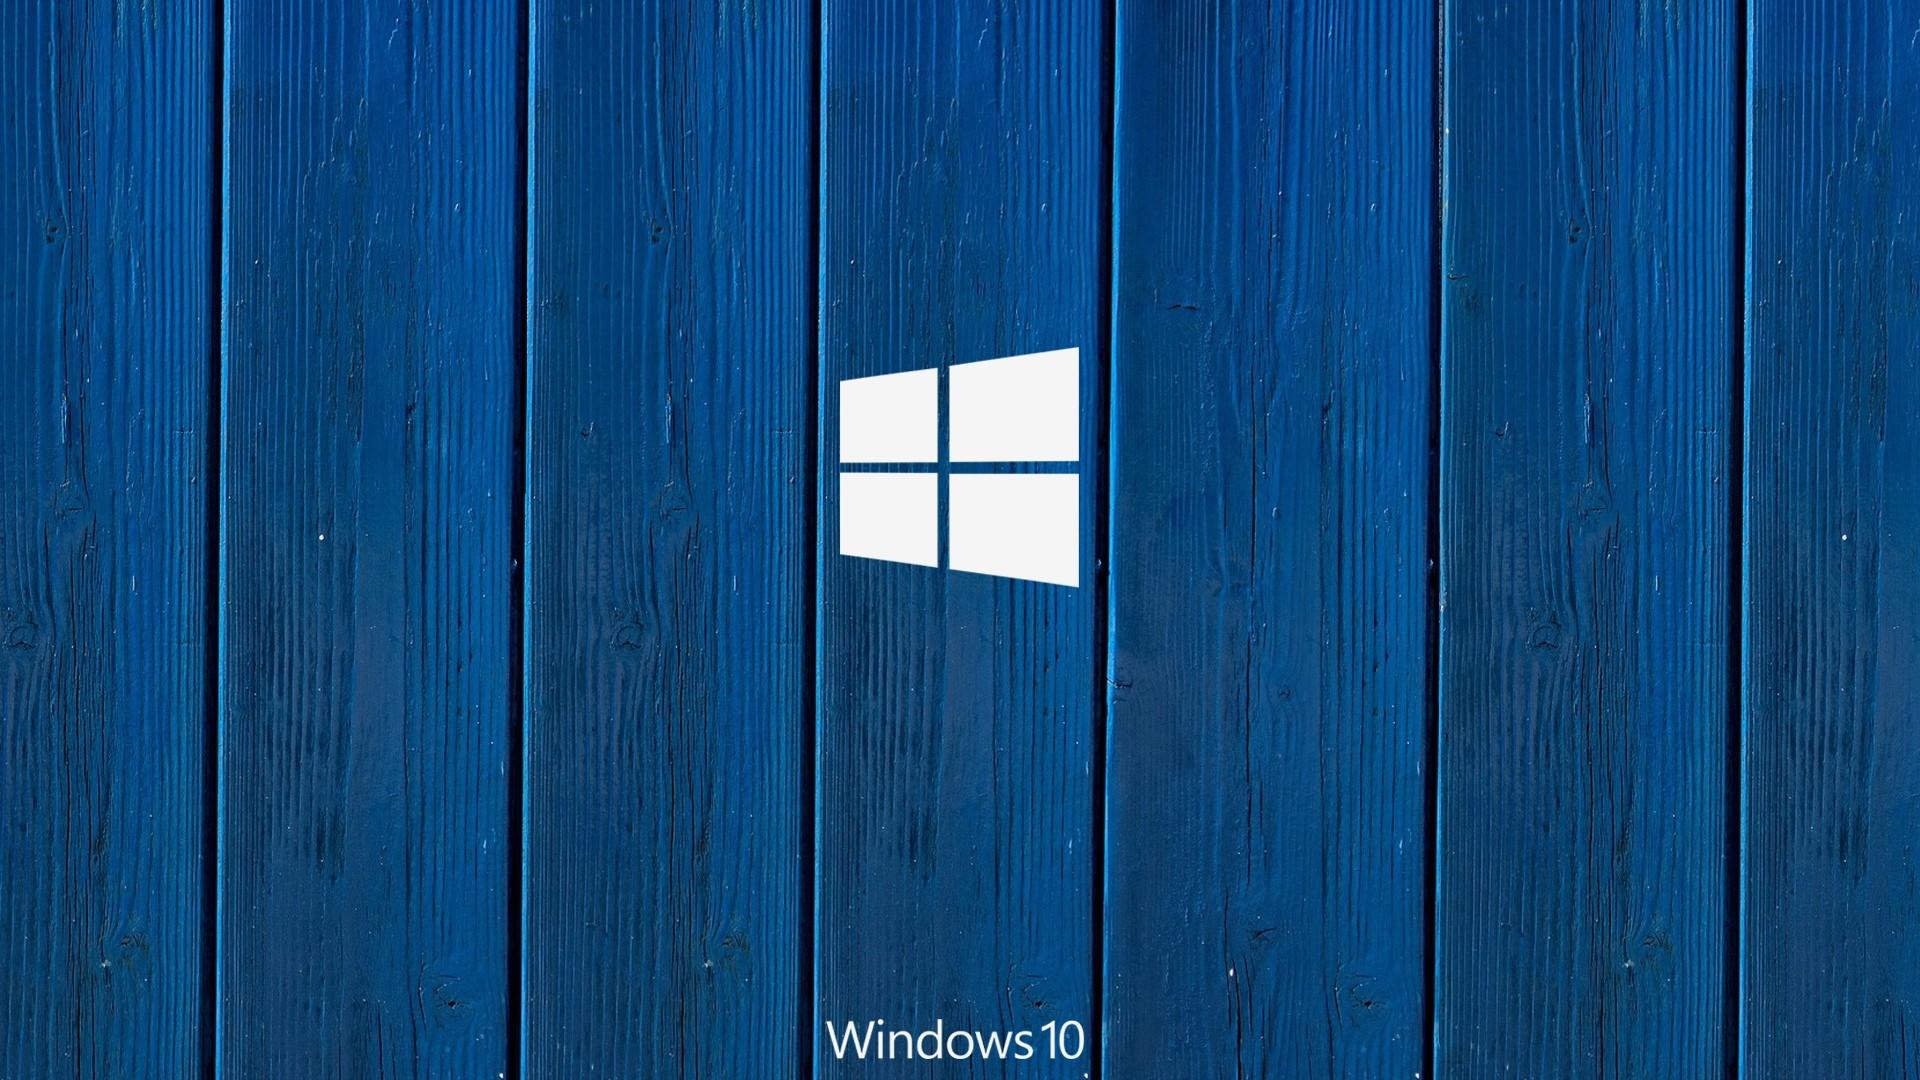 Windows Wallpaper 1920x1080 ·①